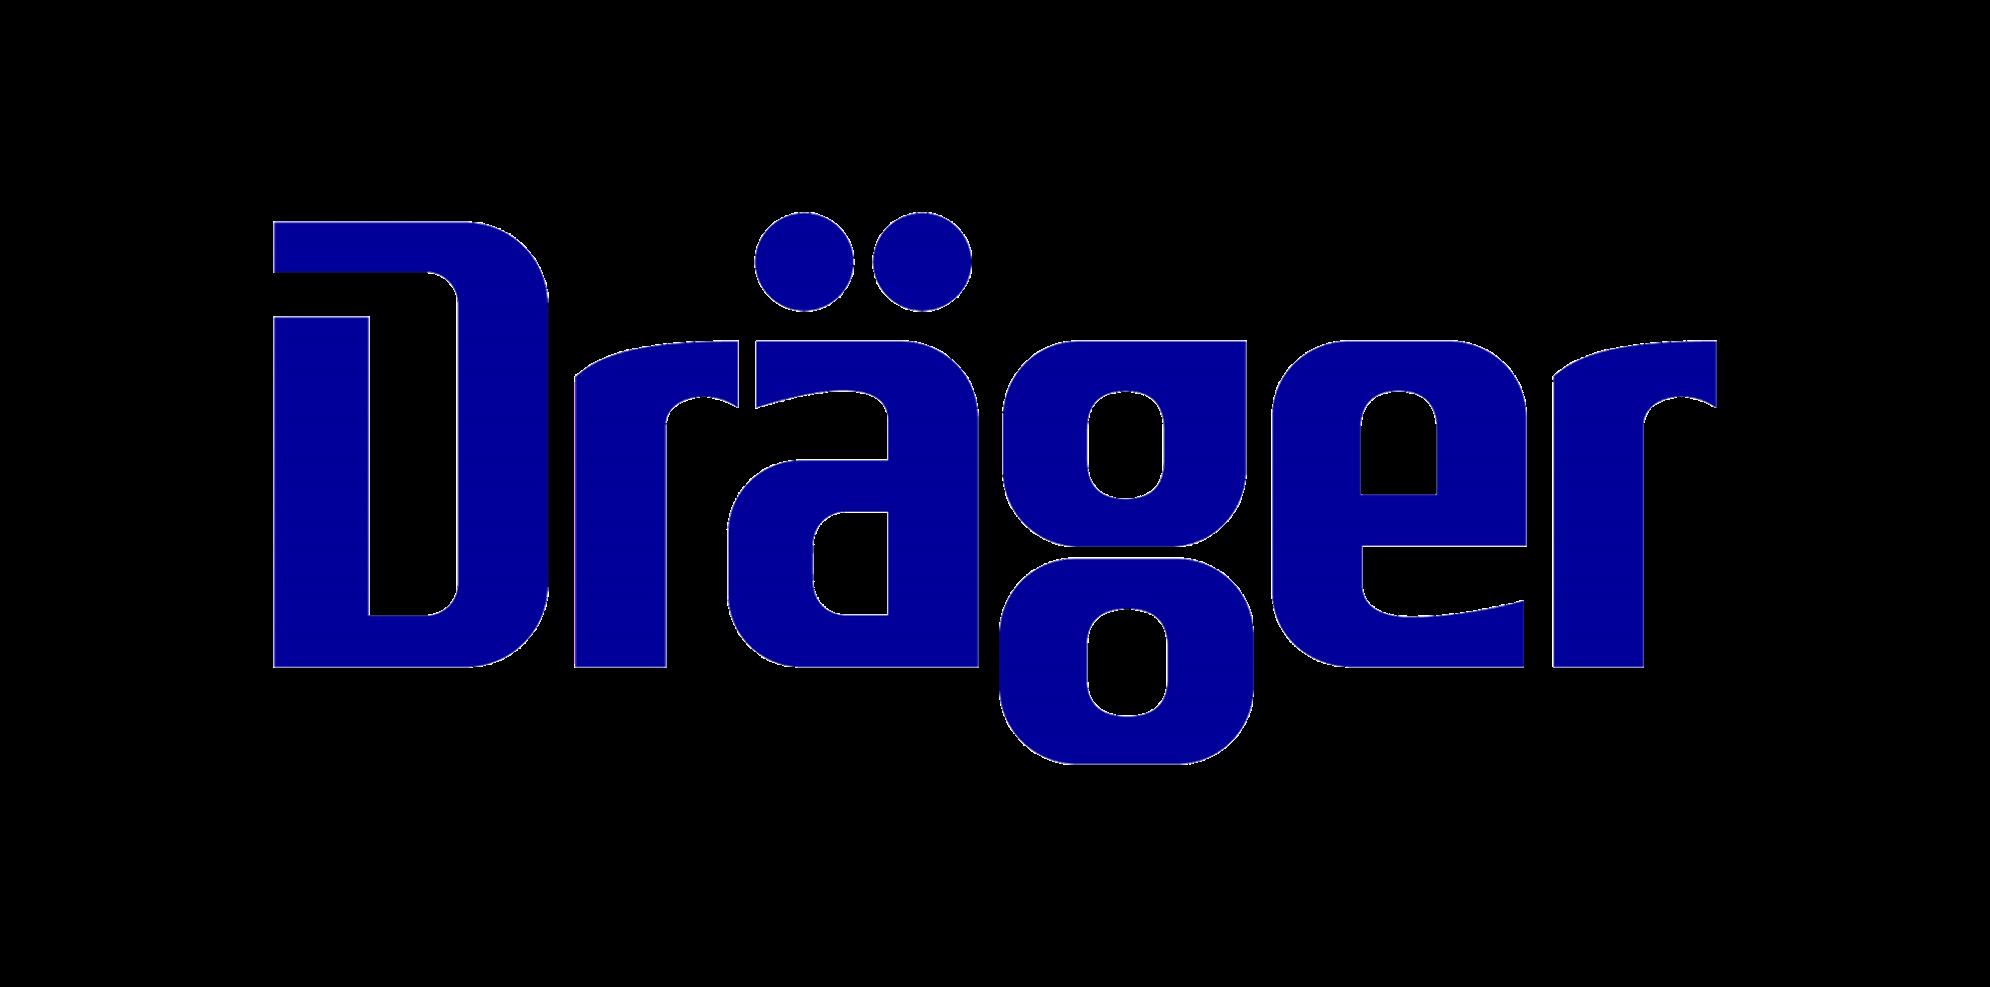 DRAGER - NOTA DE PRENSA